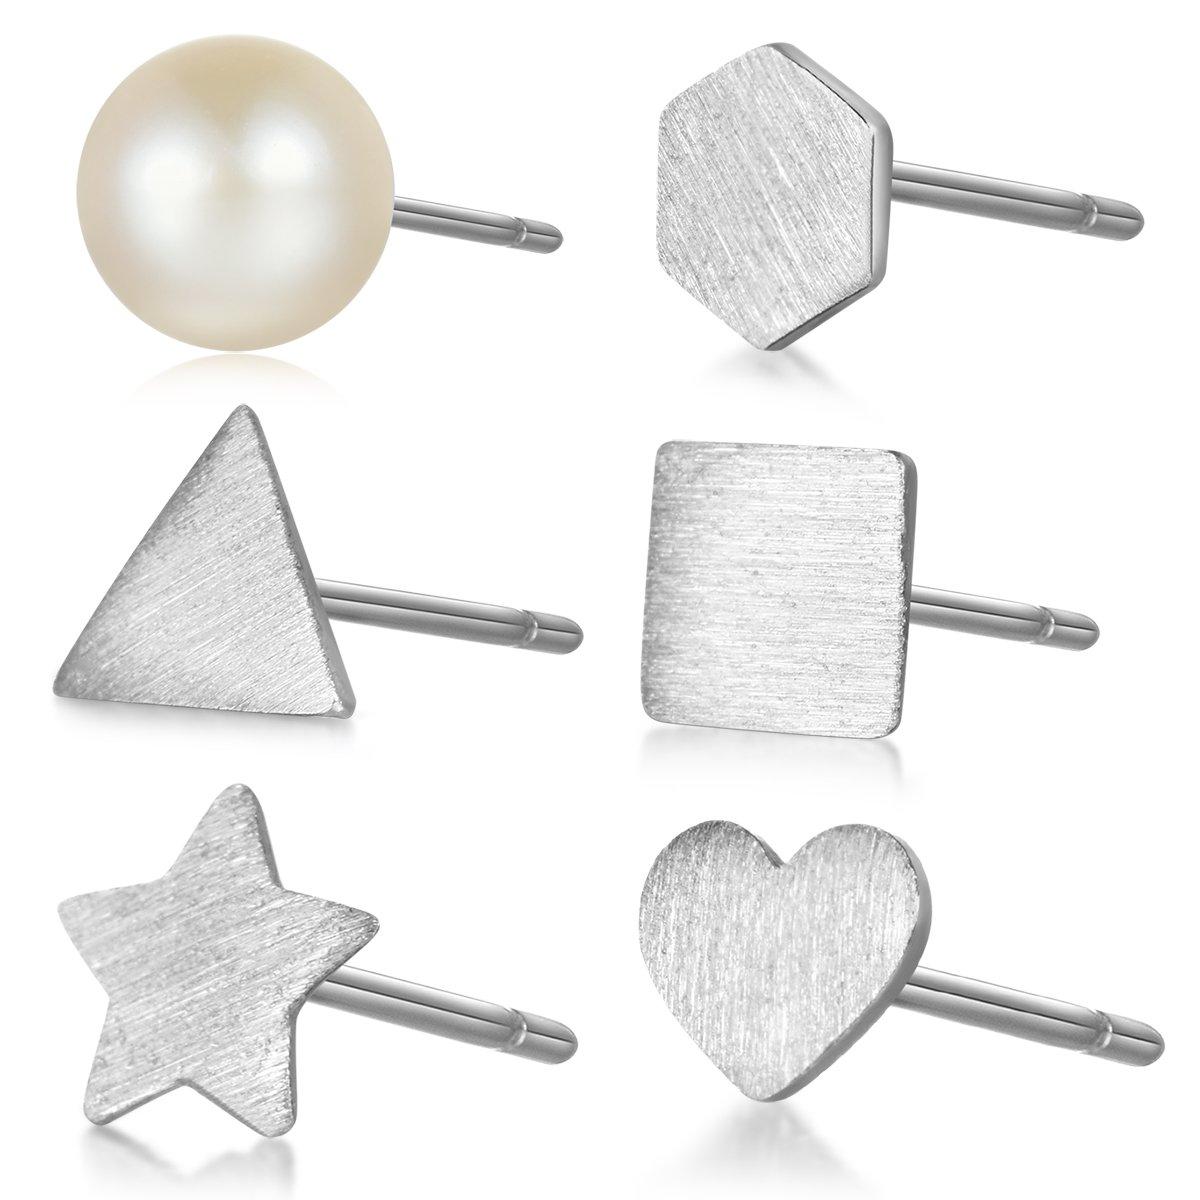 MASOP Hypoallergenic 925 Sterling Silver Tiny Stud Earrings Set for Cartilage Women Men 6 Pcs